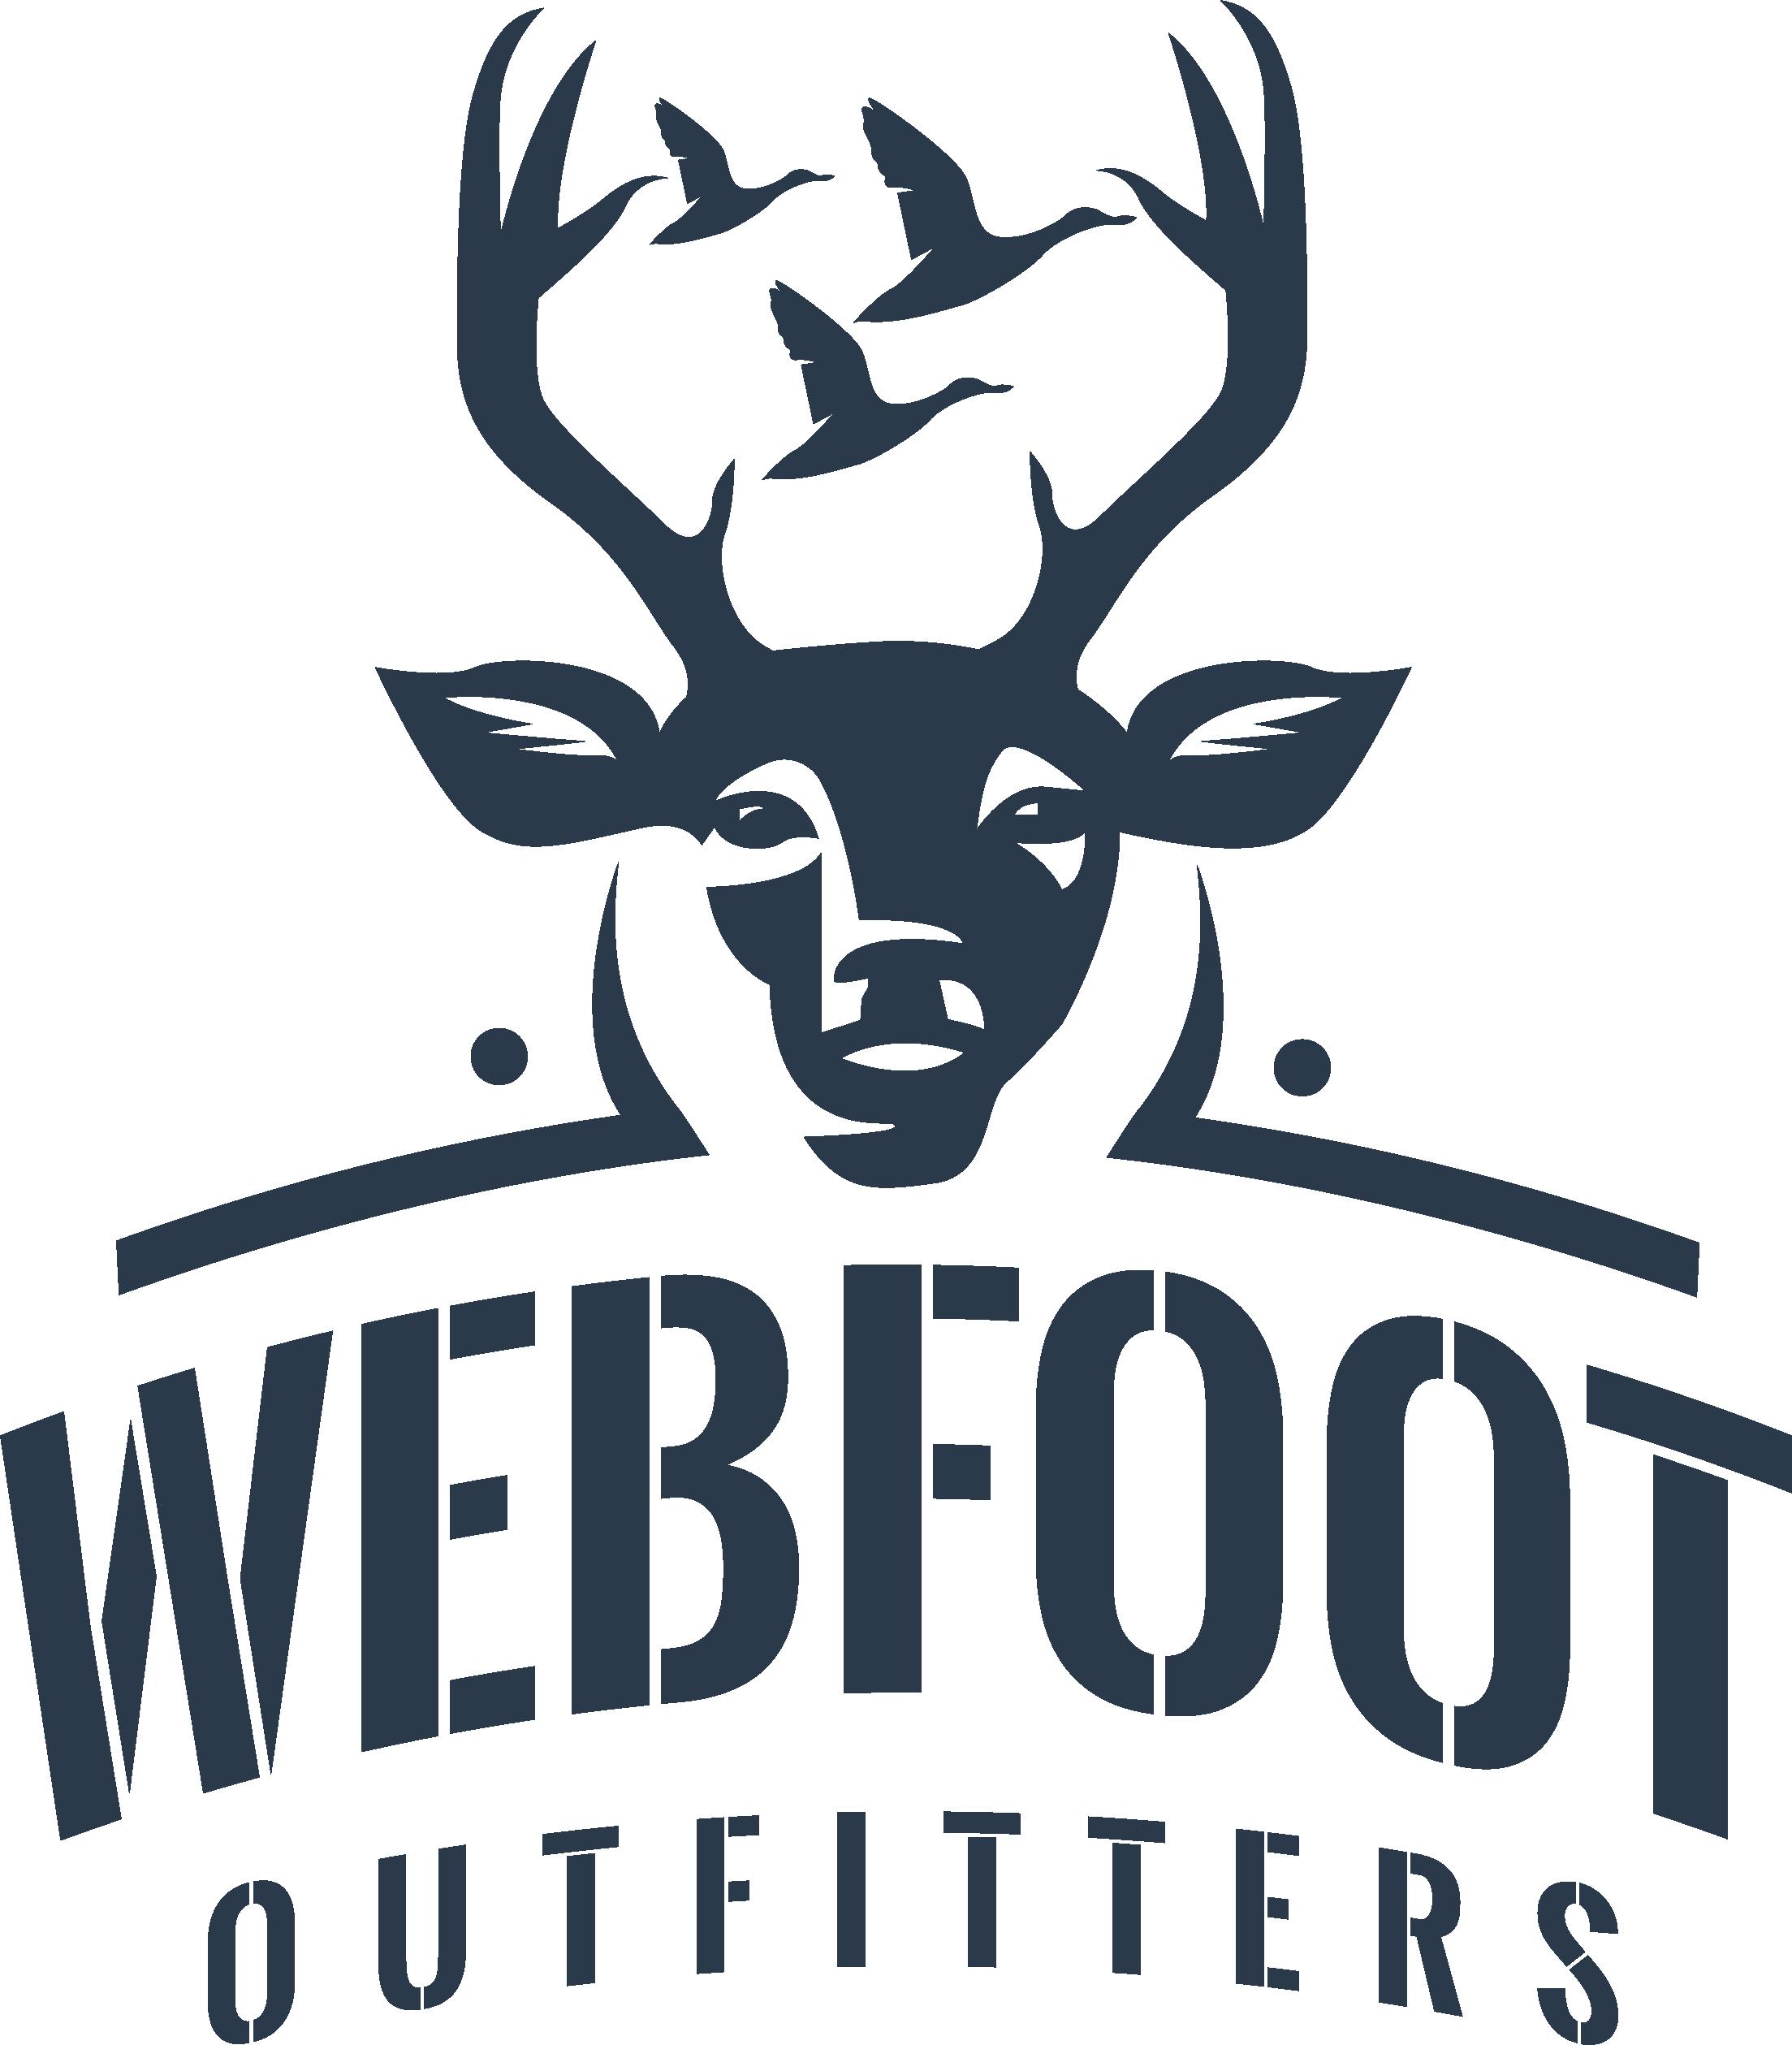 webfoot.png